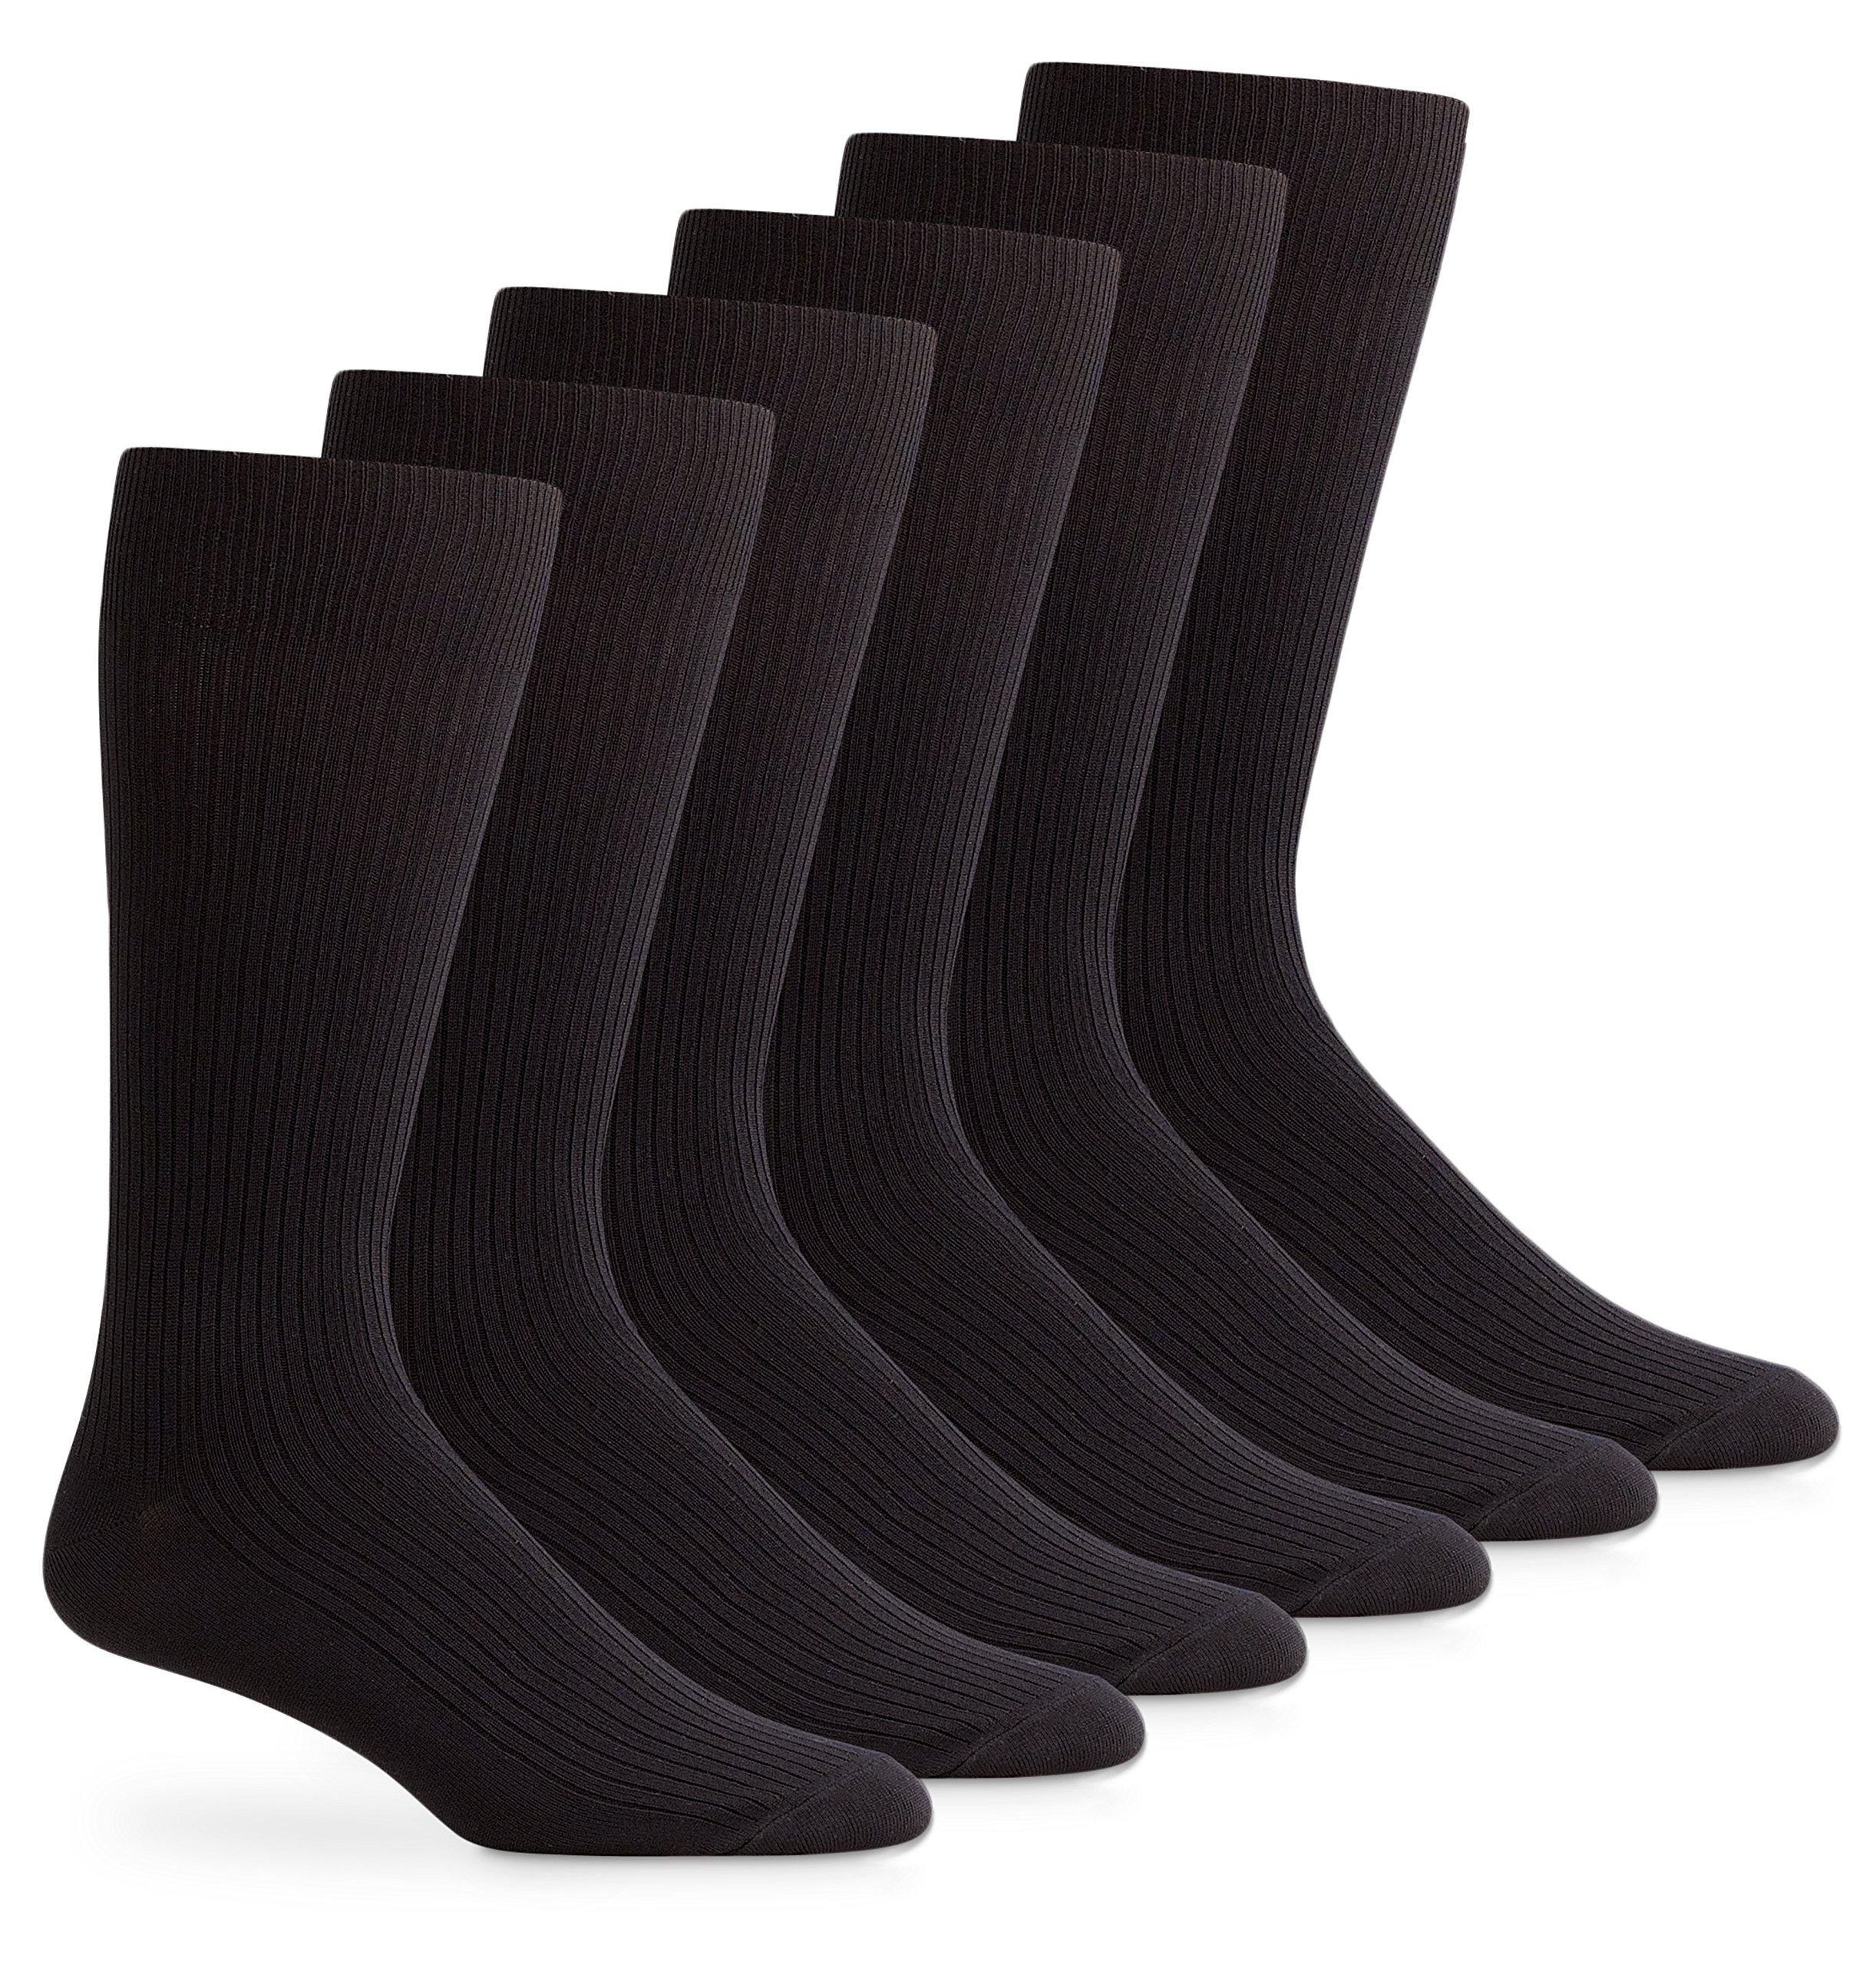 Jefferies Socks Womens Smooth Microfiber Crew Dress Work Boot Socks 6 Pair Pack (Sock Size 6-8 - Shoe Size 4-6.5, Black)